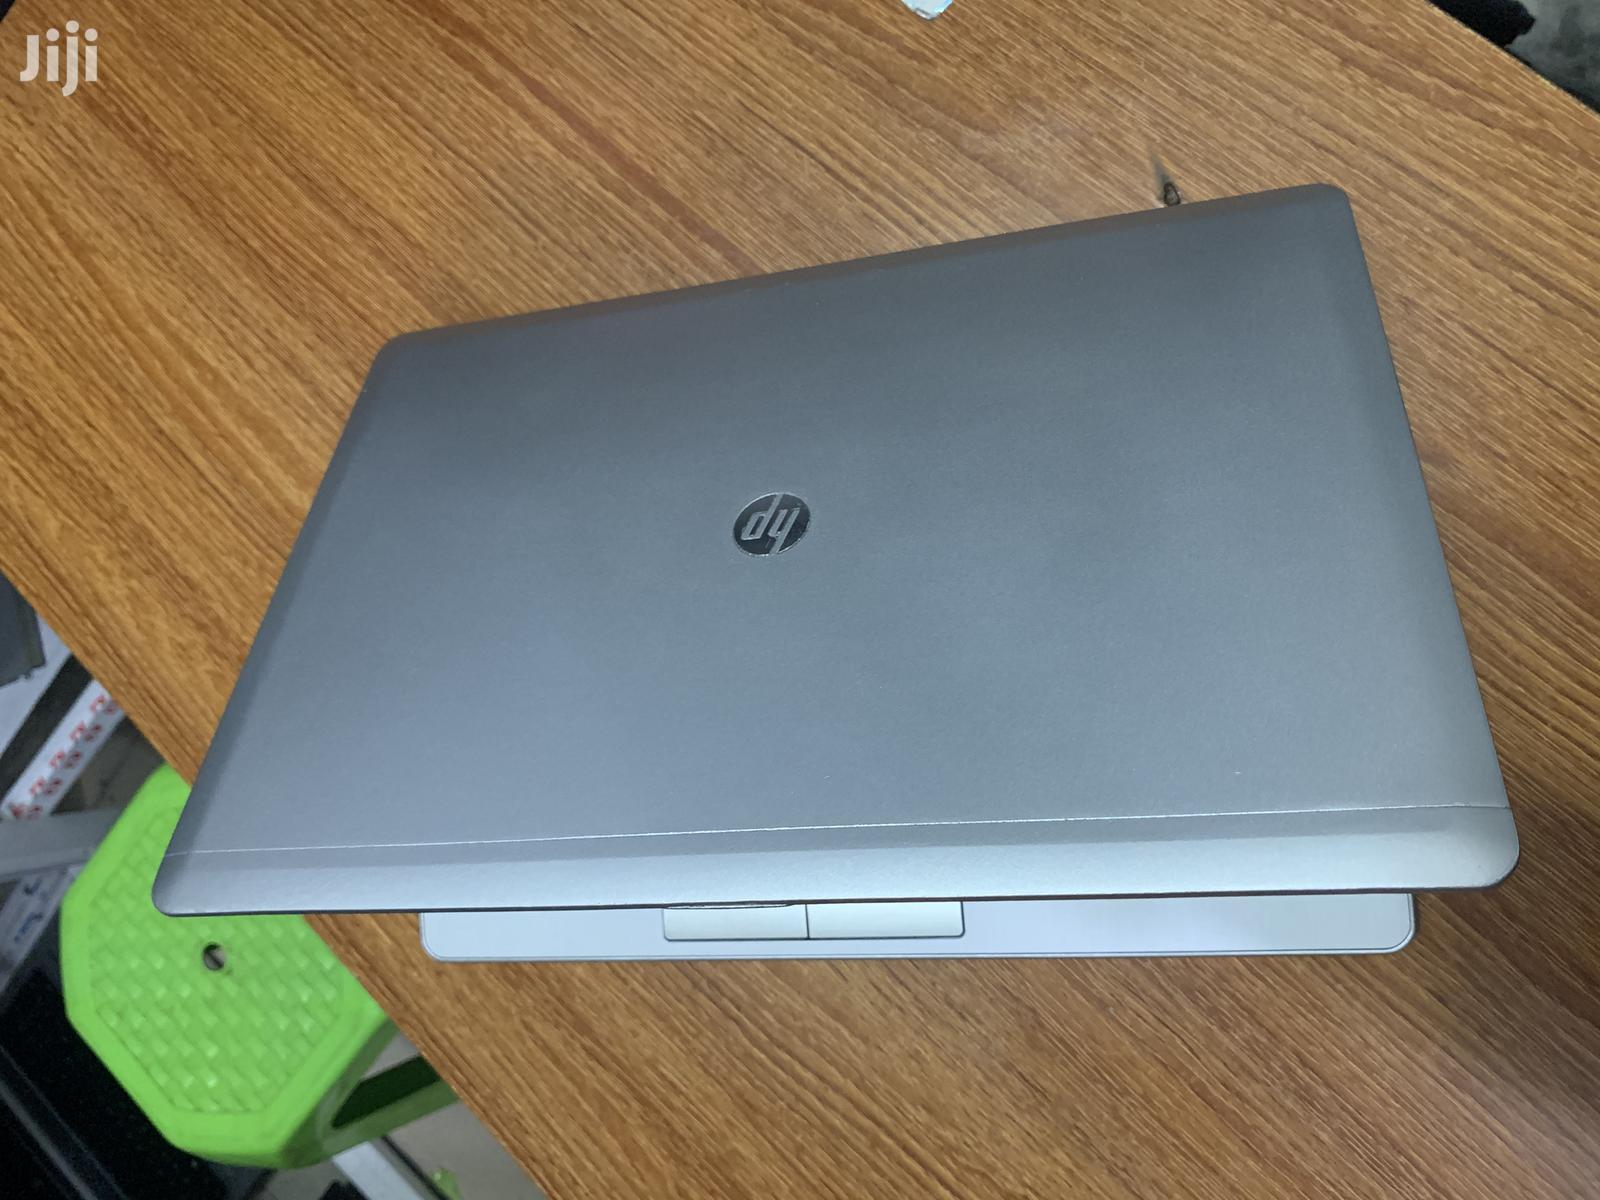 Laptop HP EliteBook Folio 9470M 6GB Intel Core I5 SSD 160GB   Laptops & Computers for sale in Kokomlemle, Greater Accra, Ghana